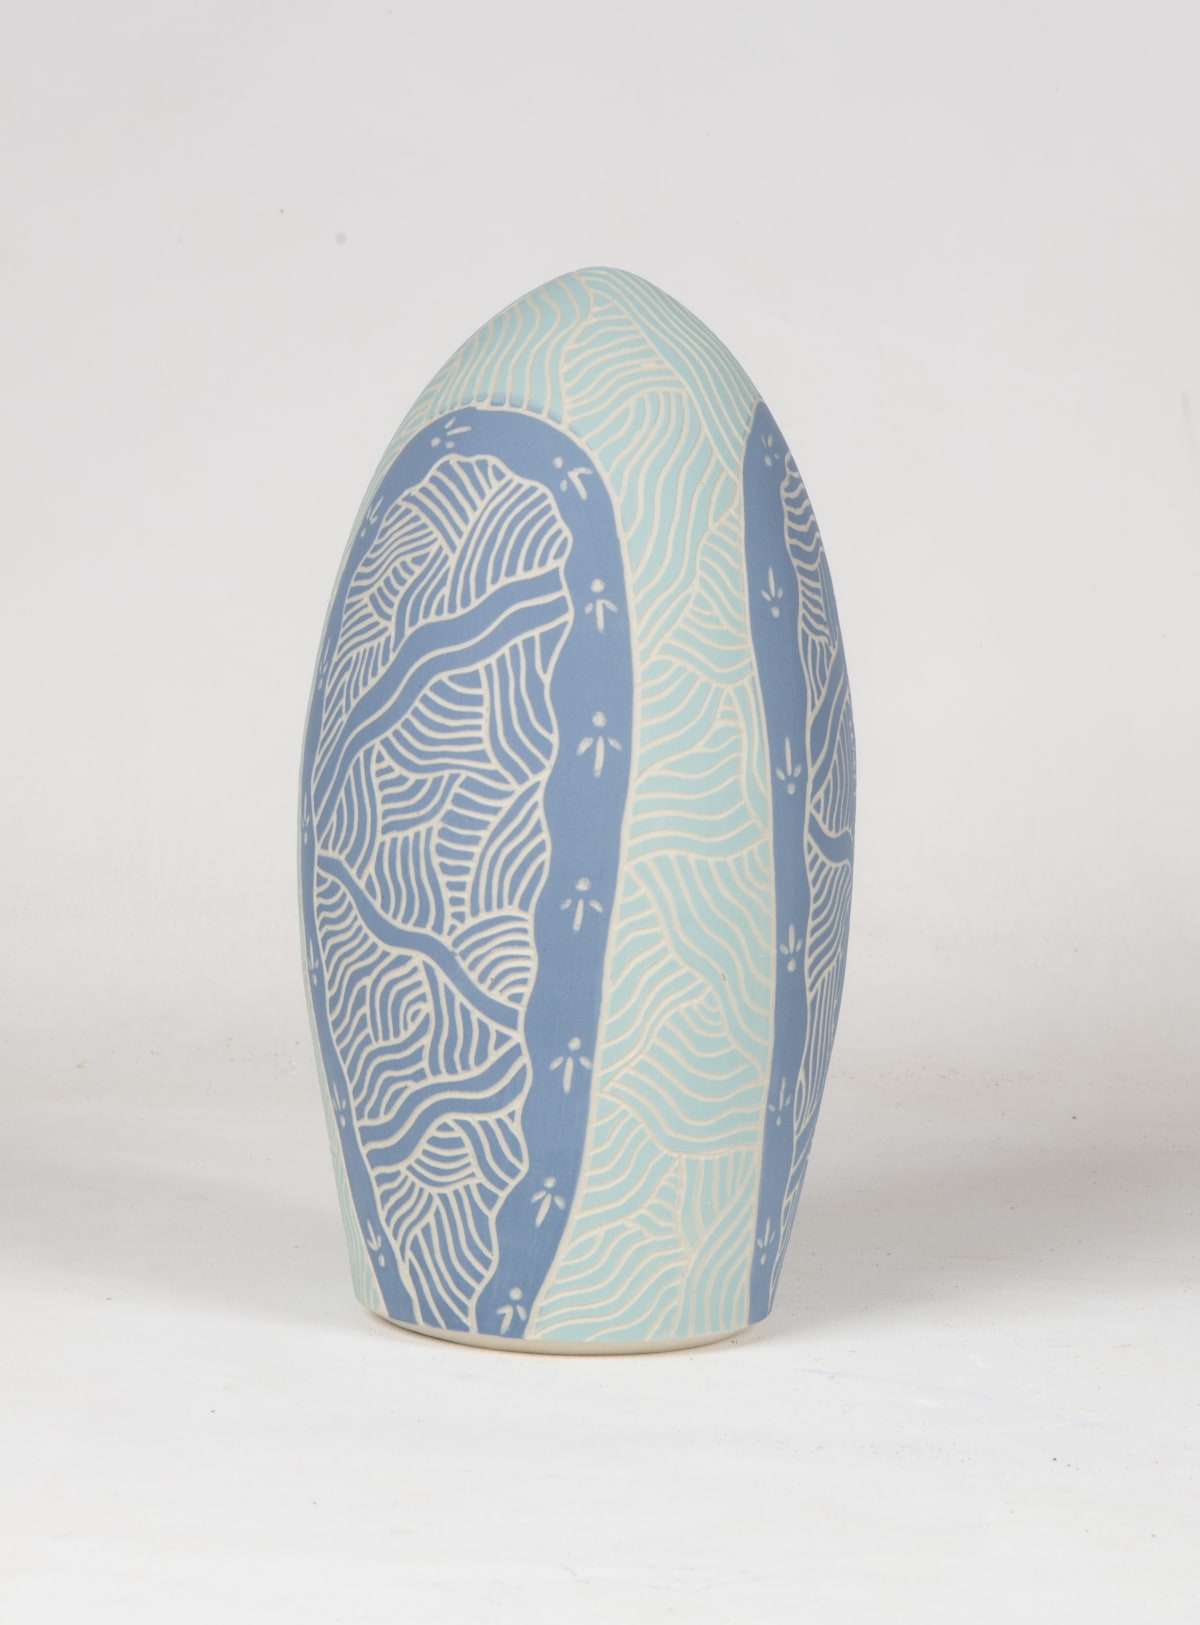 Tjutjuna Andy Tjuntuna's Kalaya, 2018 Stoneware 28 x 13 cm